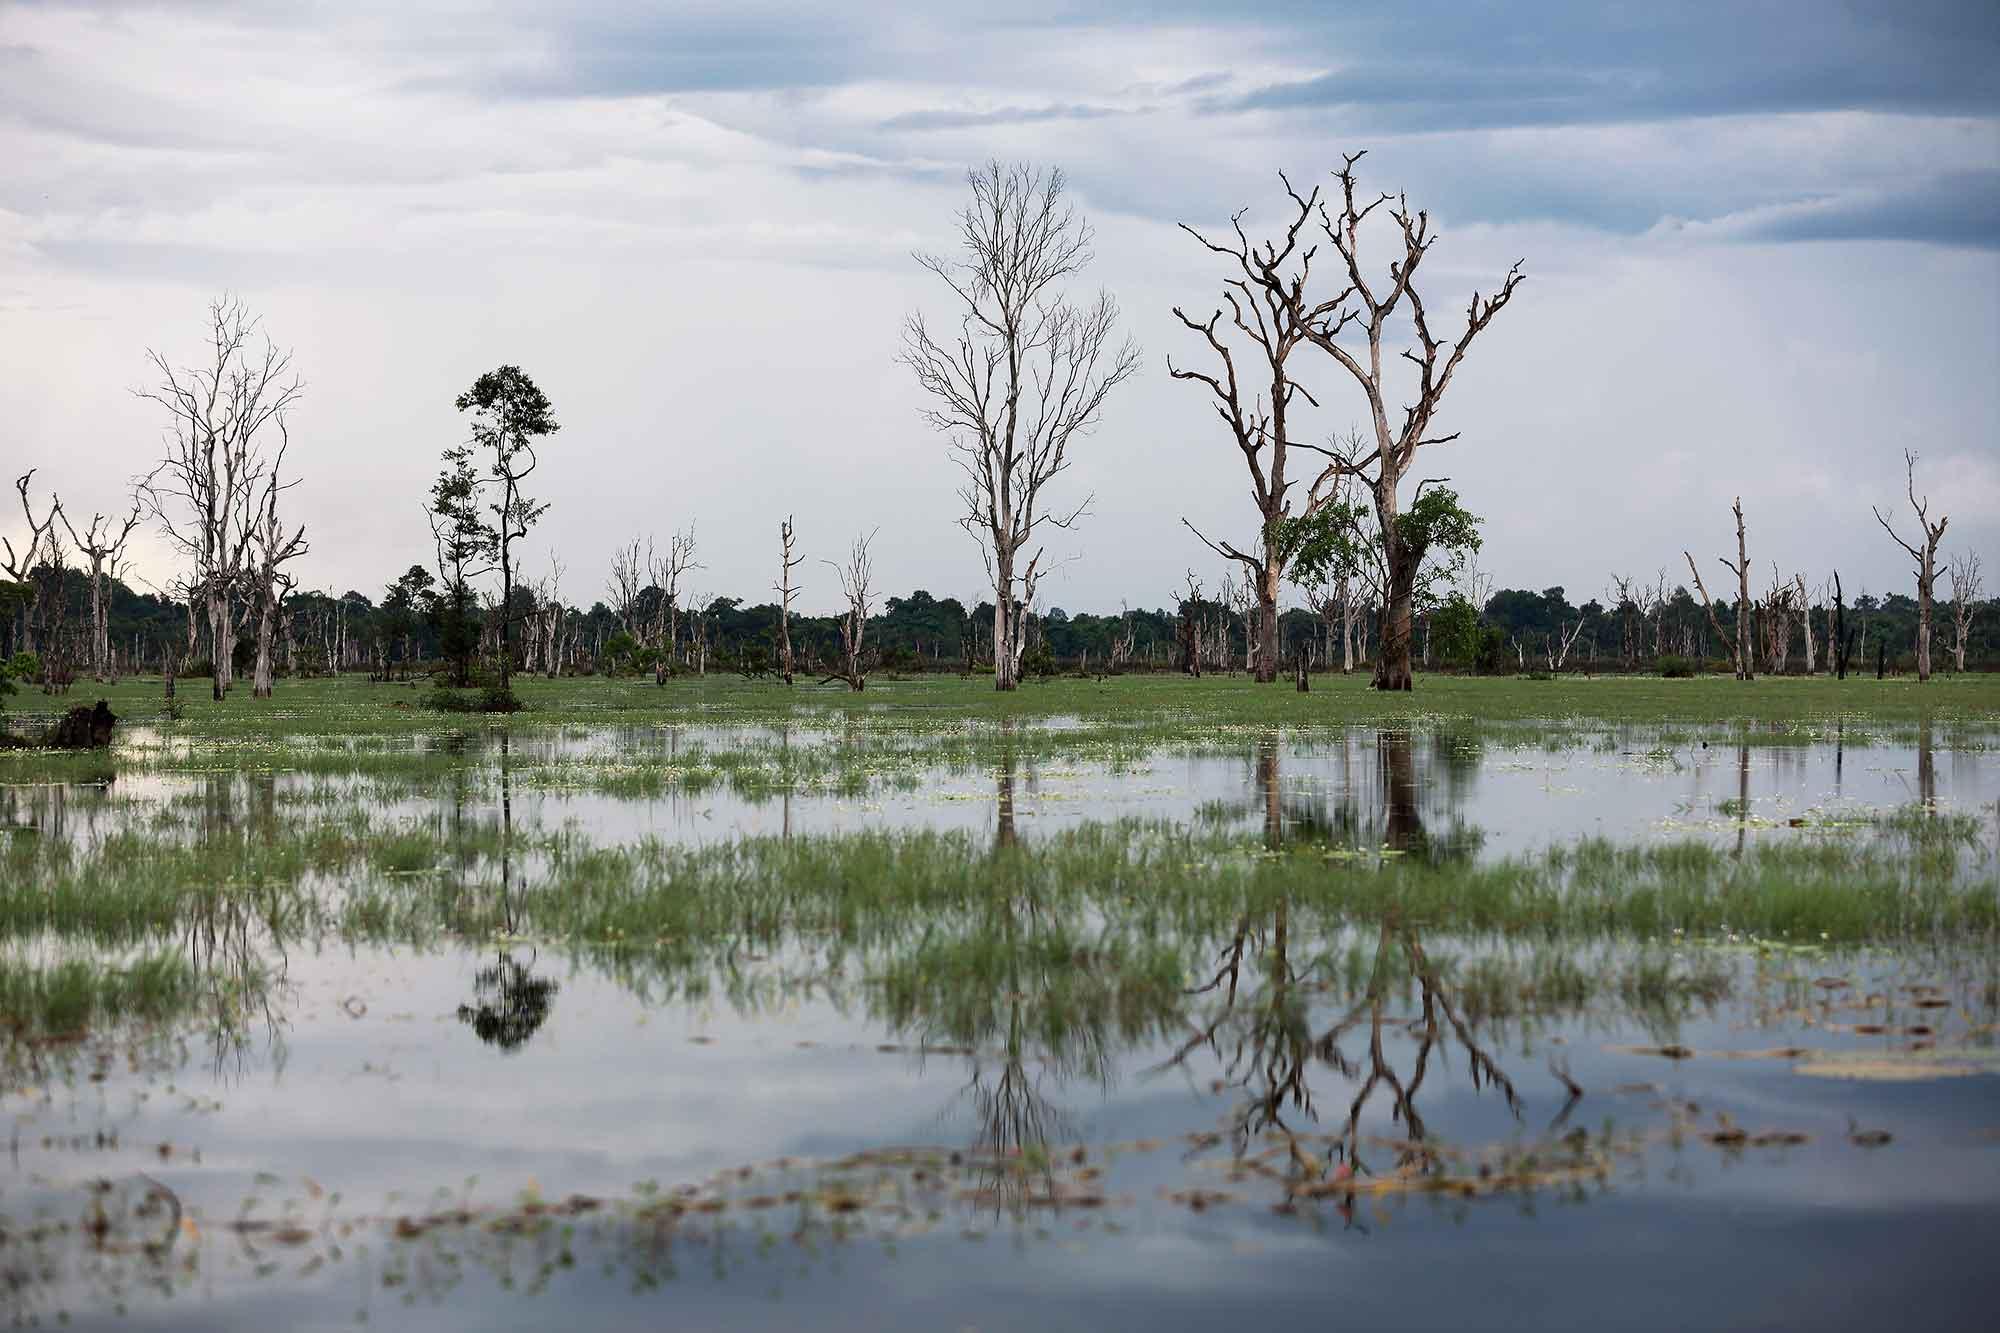 neak-pean-temple-landscape-angkor-wat-cambodia